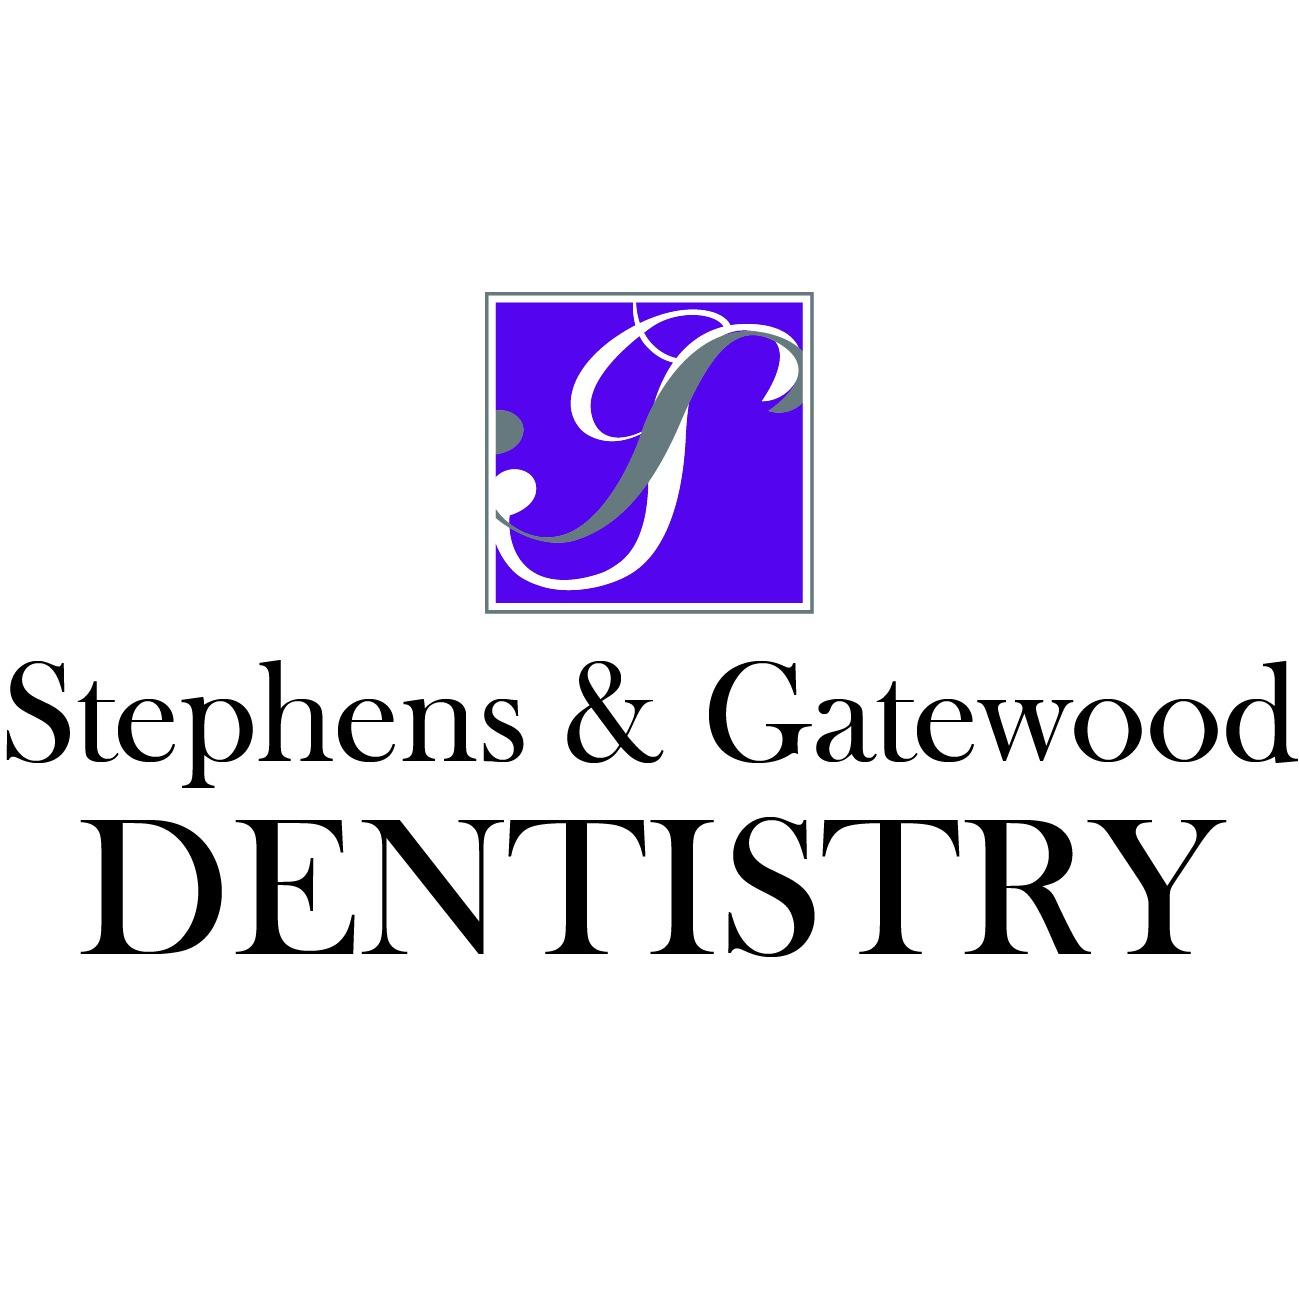 Stephens & Gatewood Dentistry